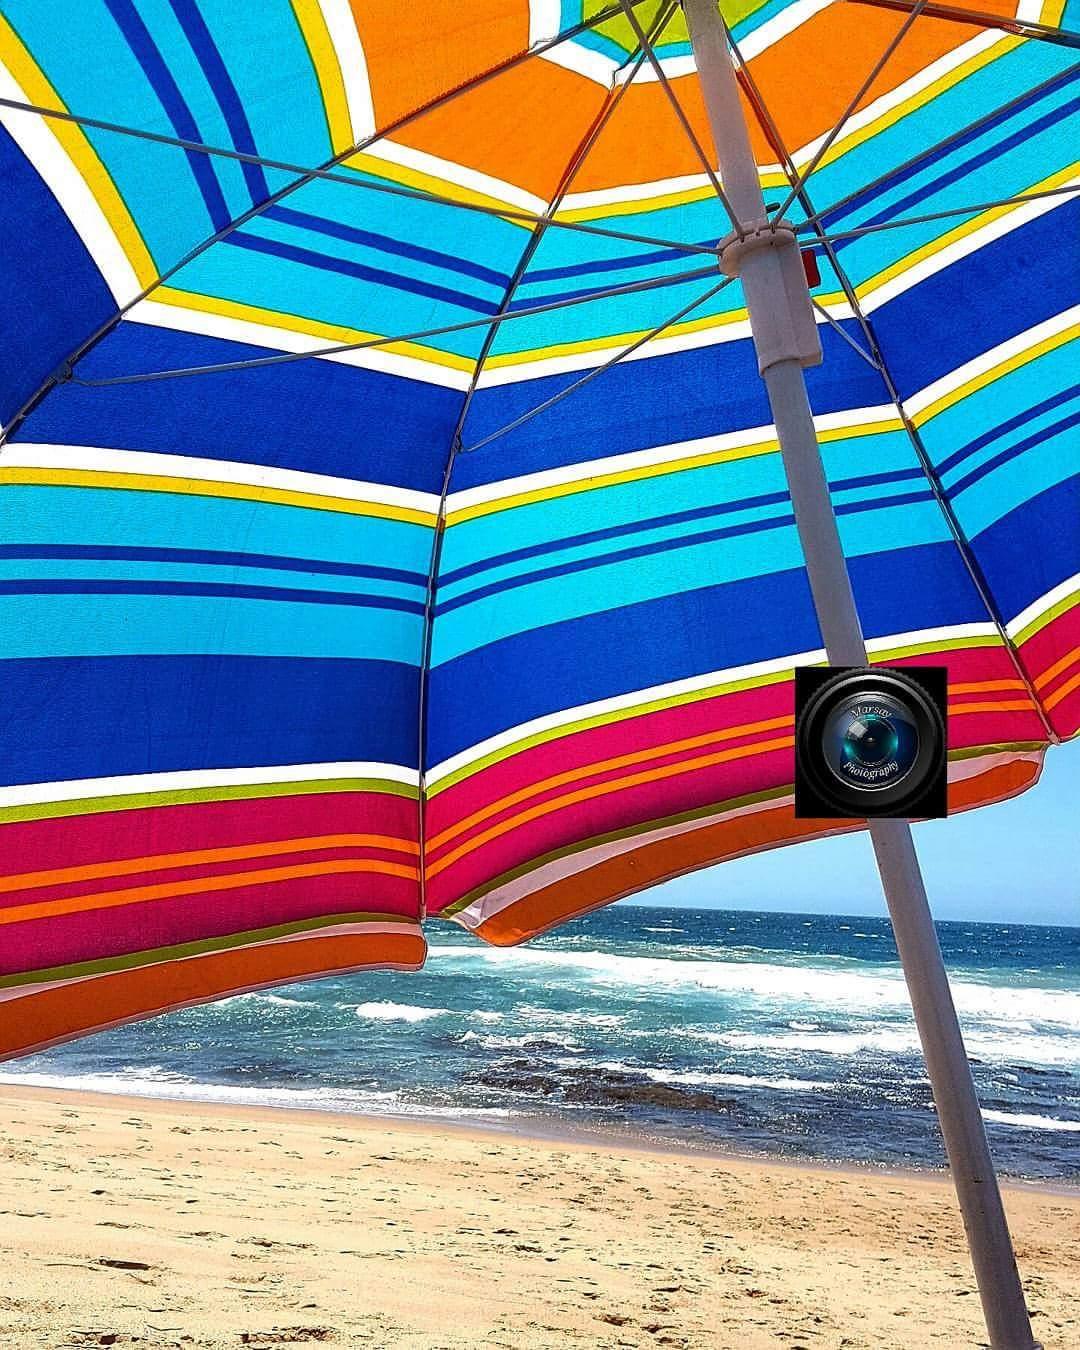 Bidding 2016 goodbye, under a Brightly coloured  umbrella. Durban, December 2016.